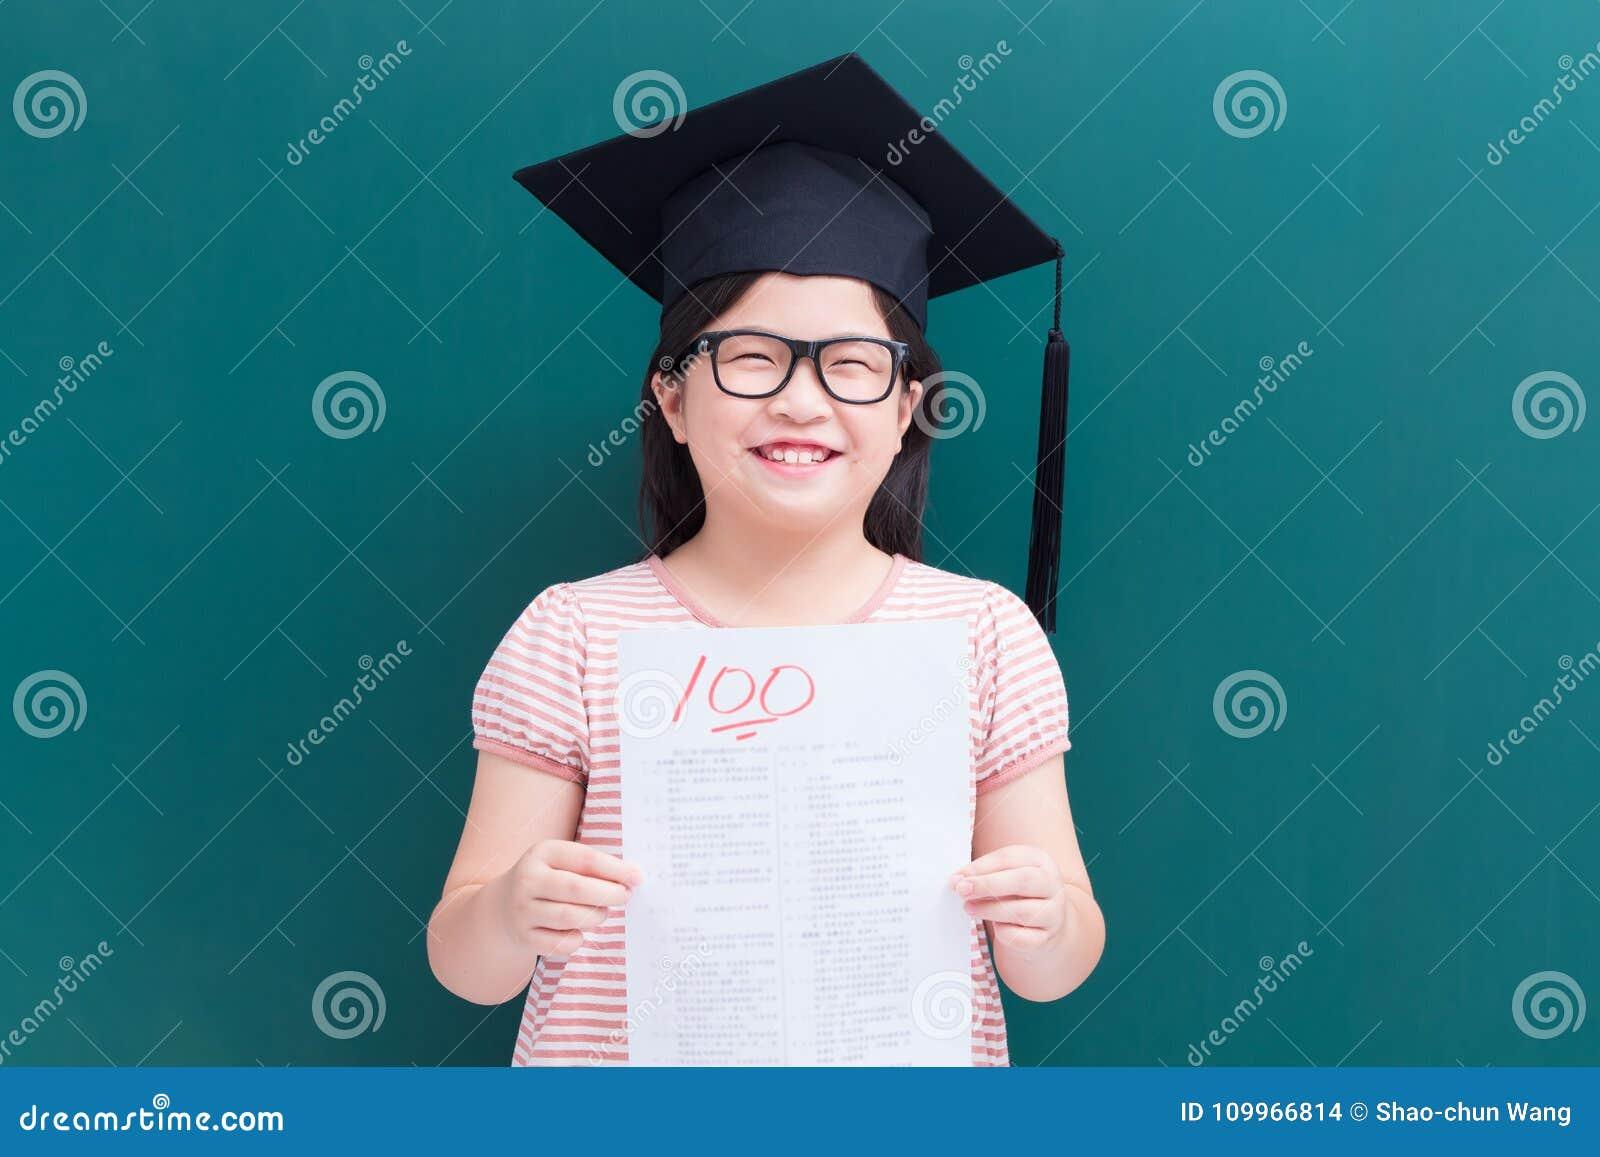 Girl test with full score